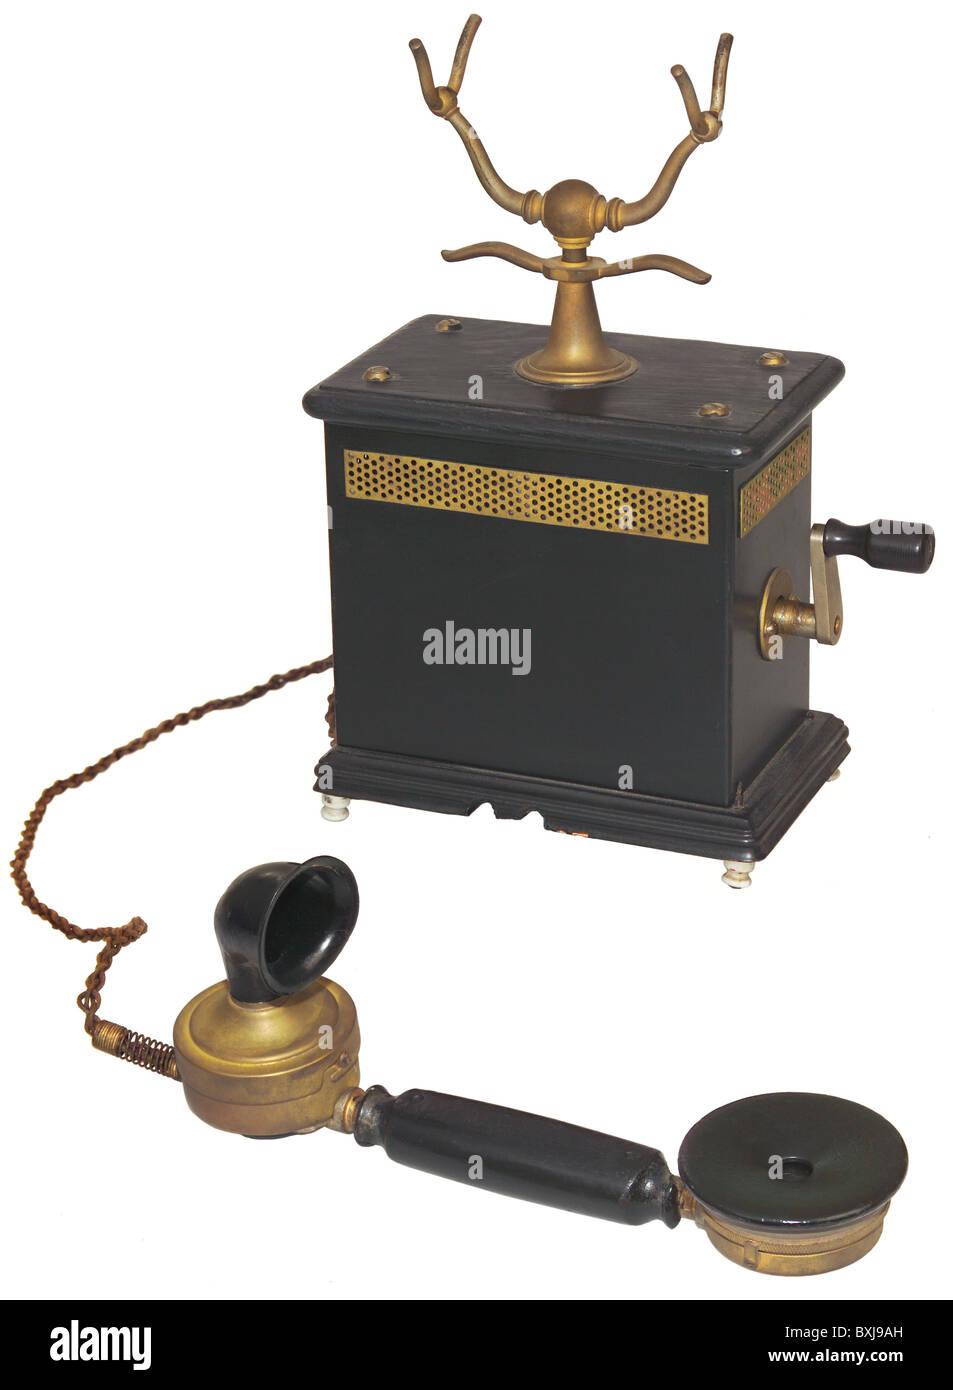 technics, telephones, telephone OB 05, Germany, circa 1905, 1900s, 00s, 20th century, historic, historical, desk - Stock Image